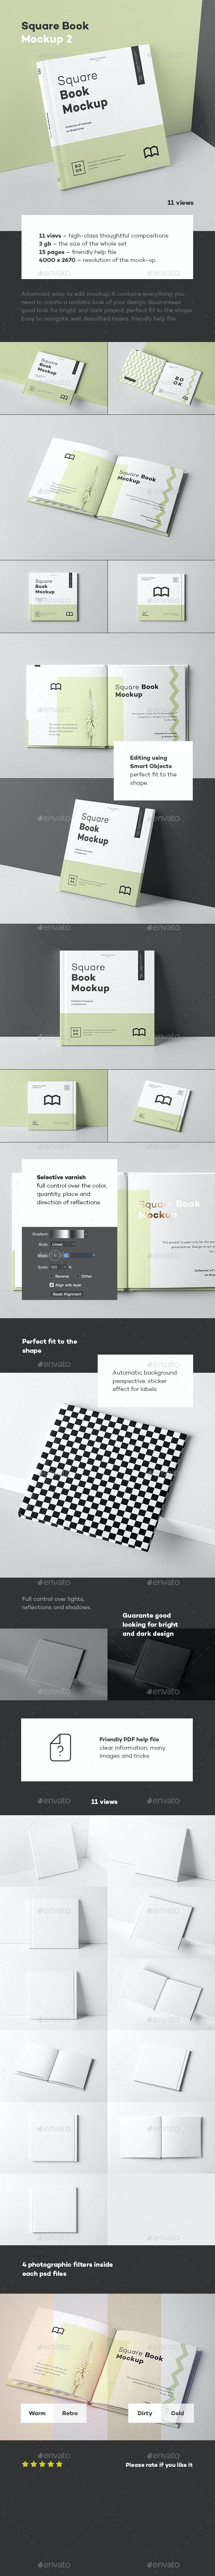 Square Book Mock up 2 - Books Print